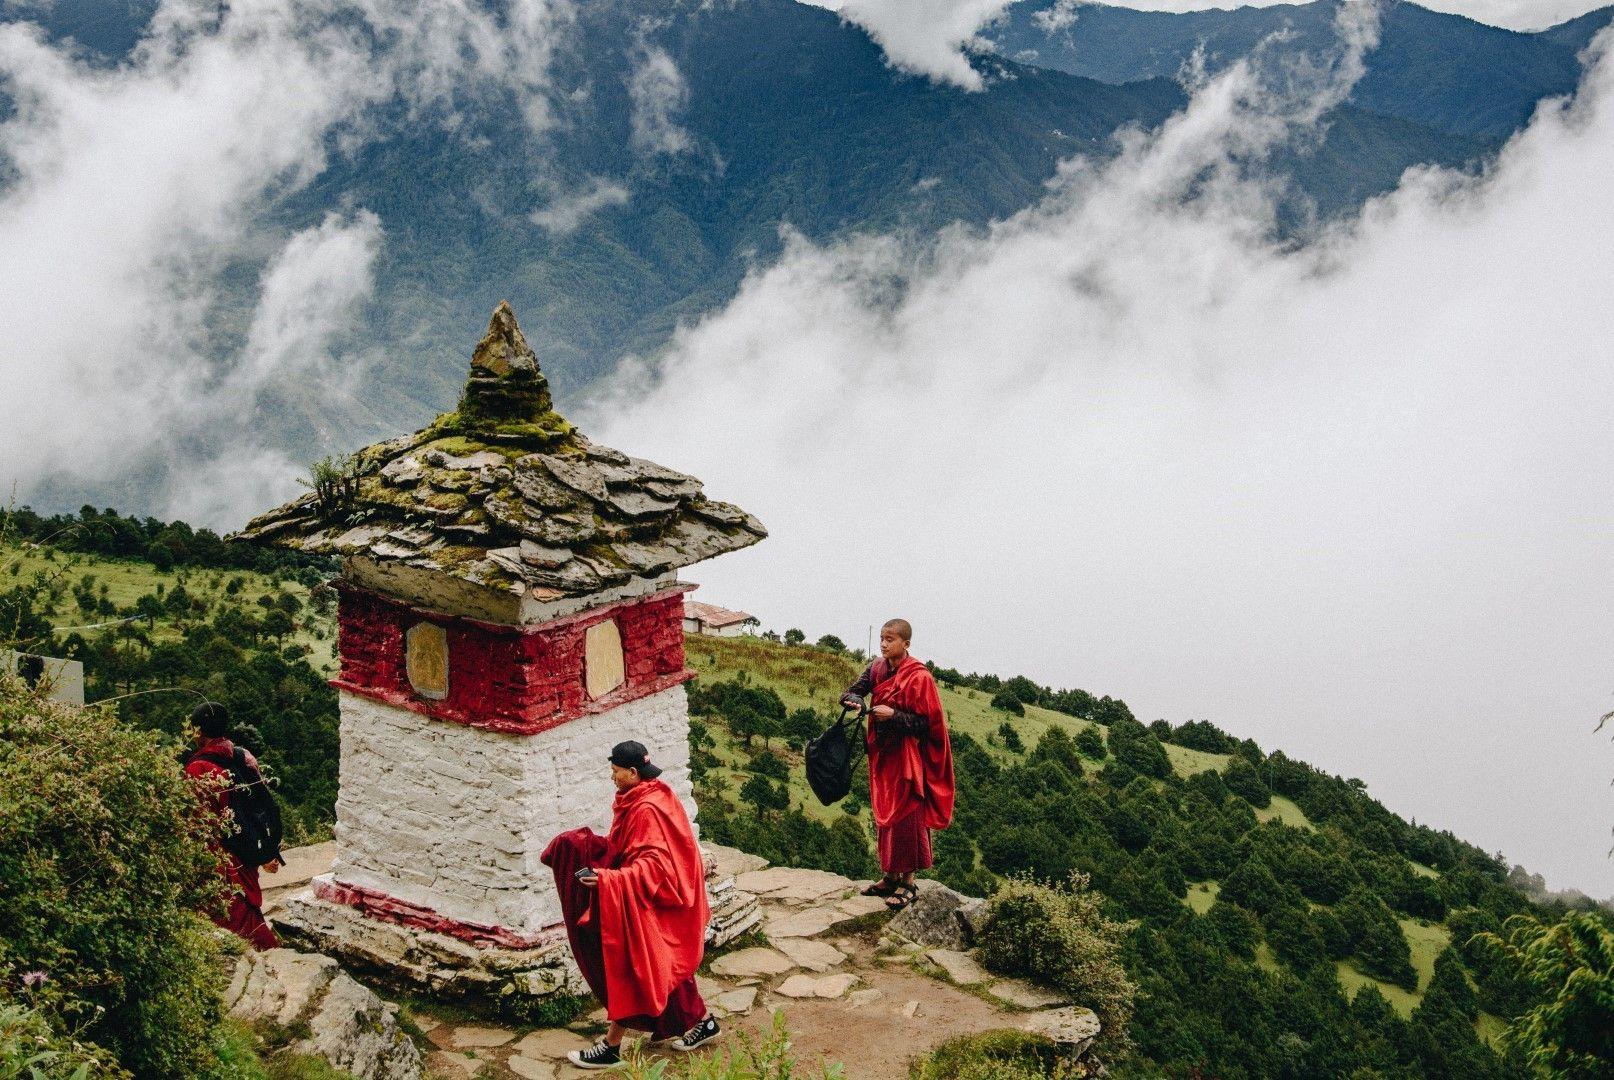 Манастирът Туджидраг Гомпа край столицата на Бутан Тхимпху